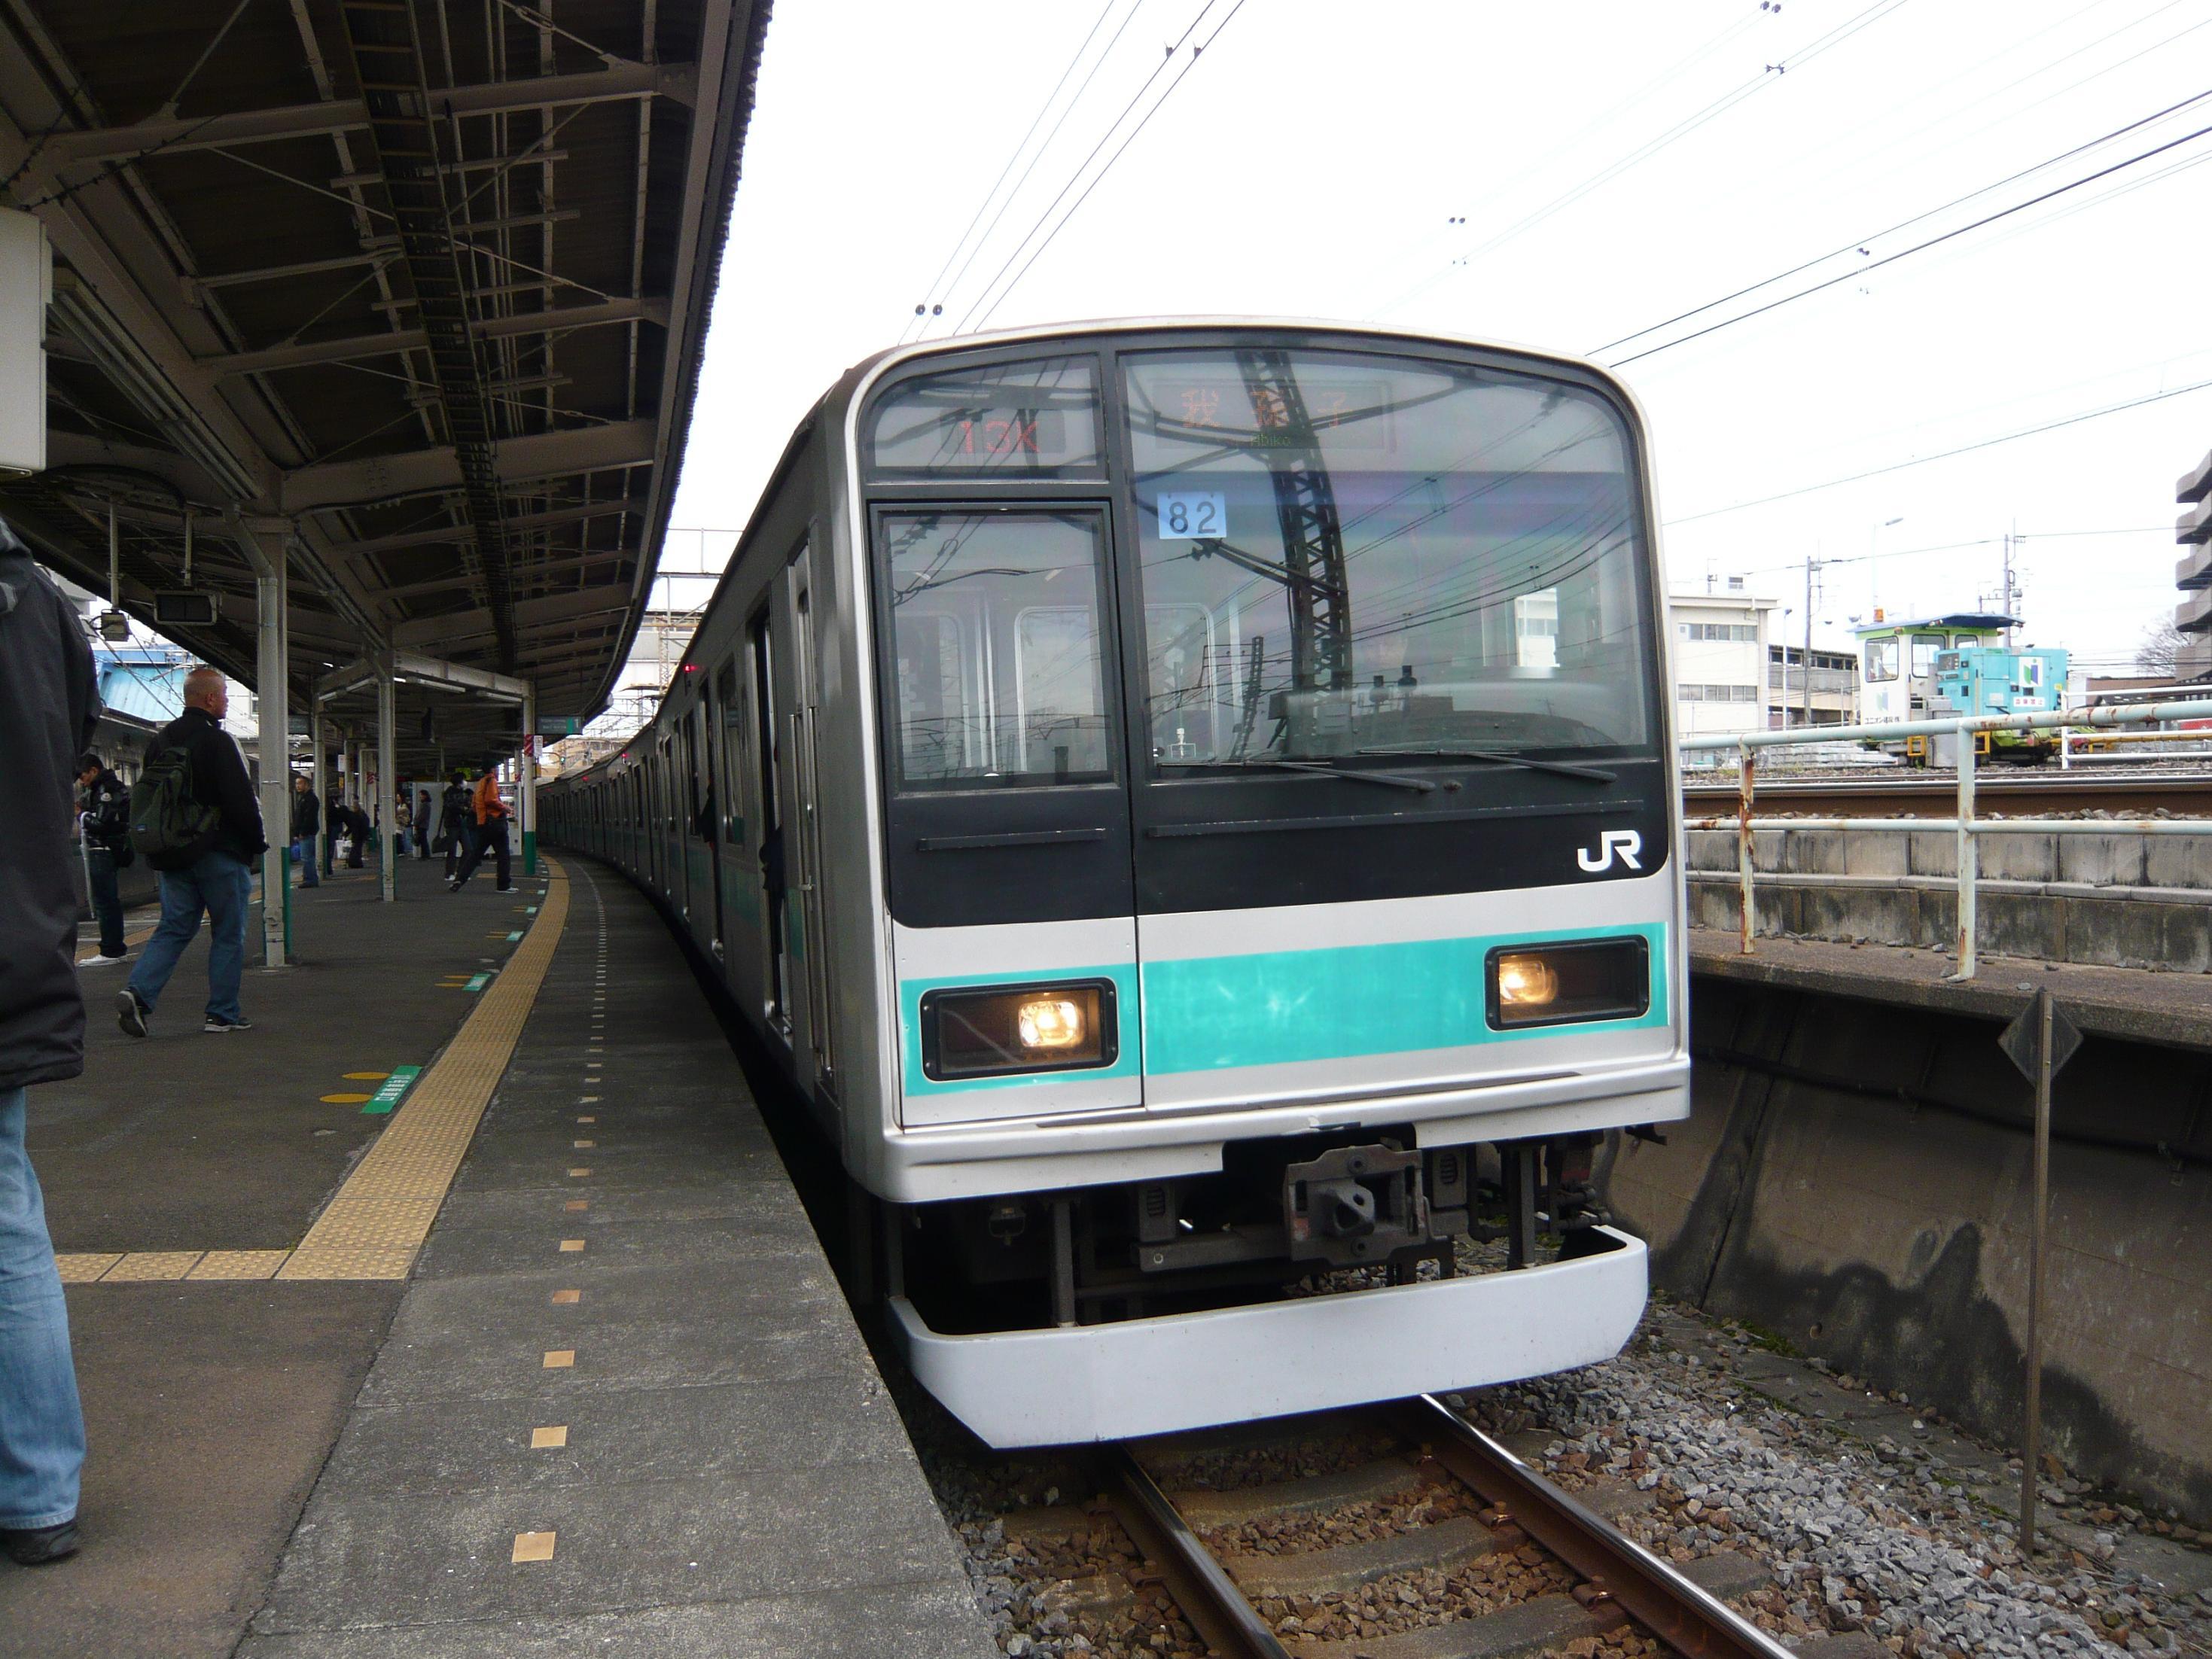 P1010766-2.JPG